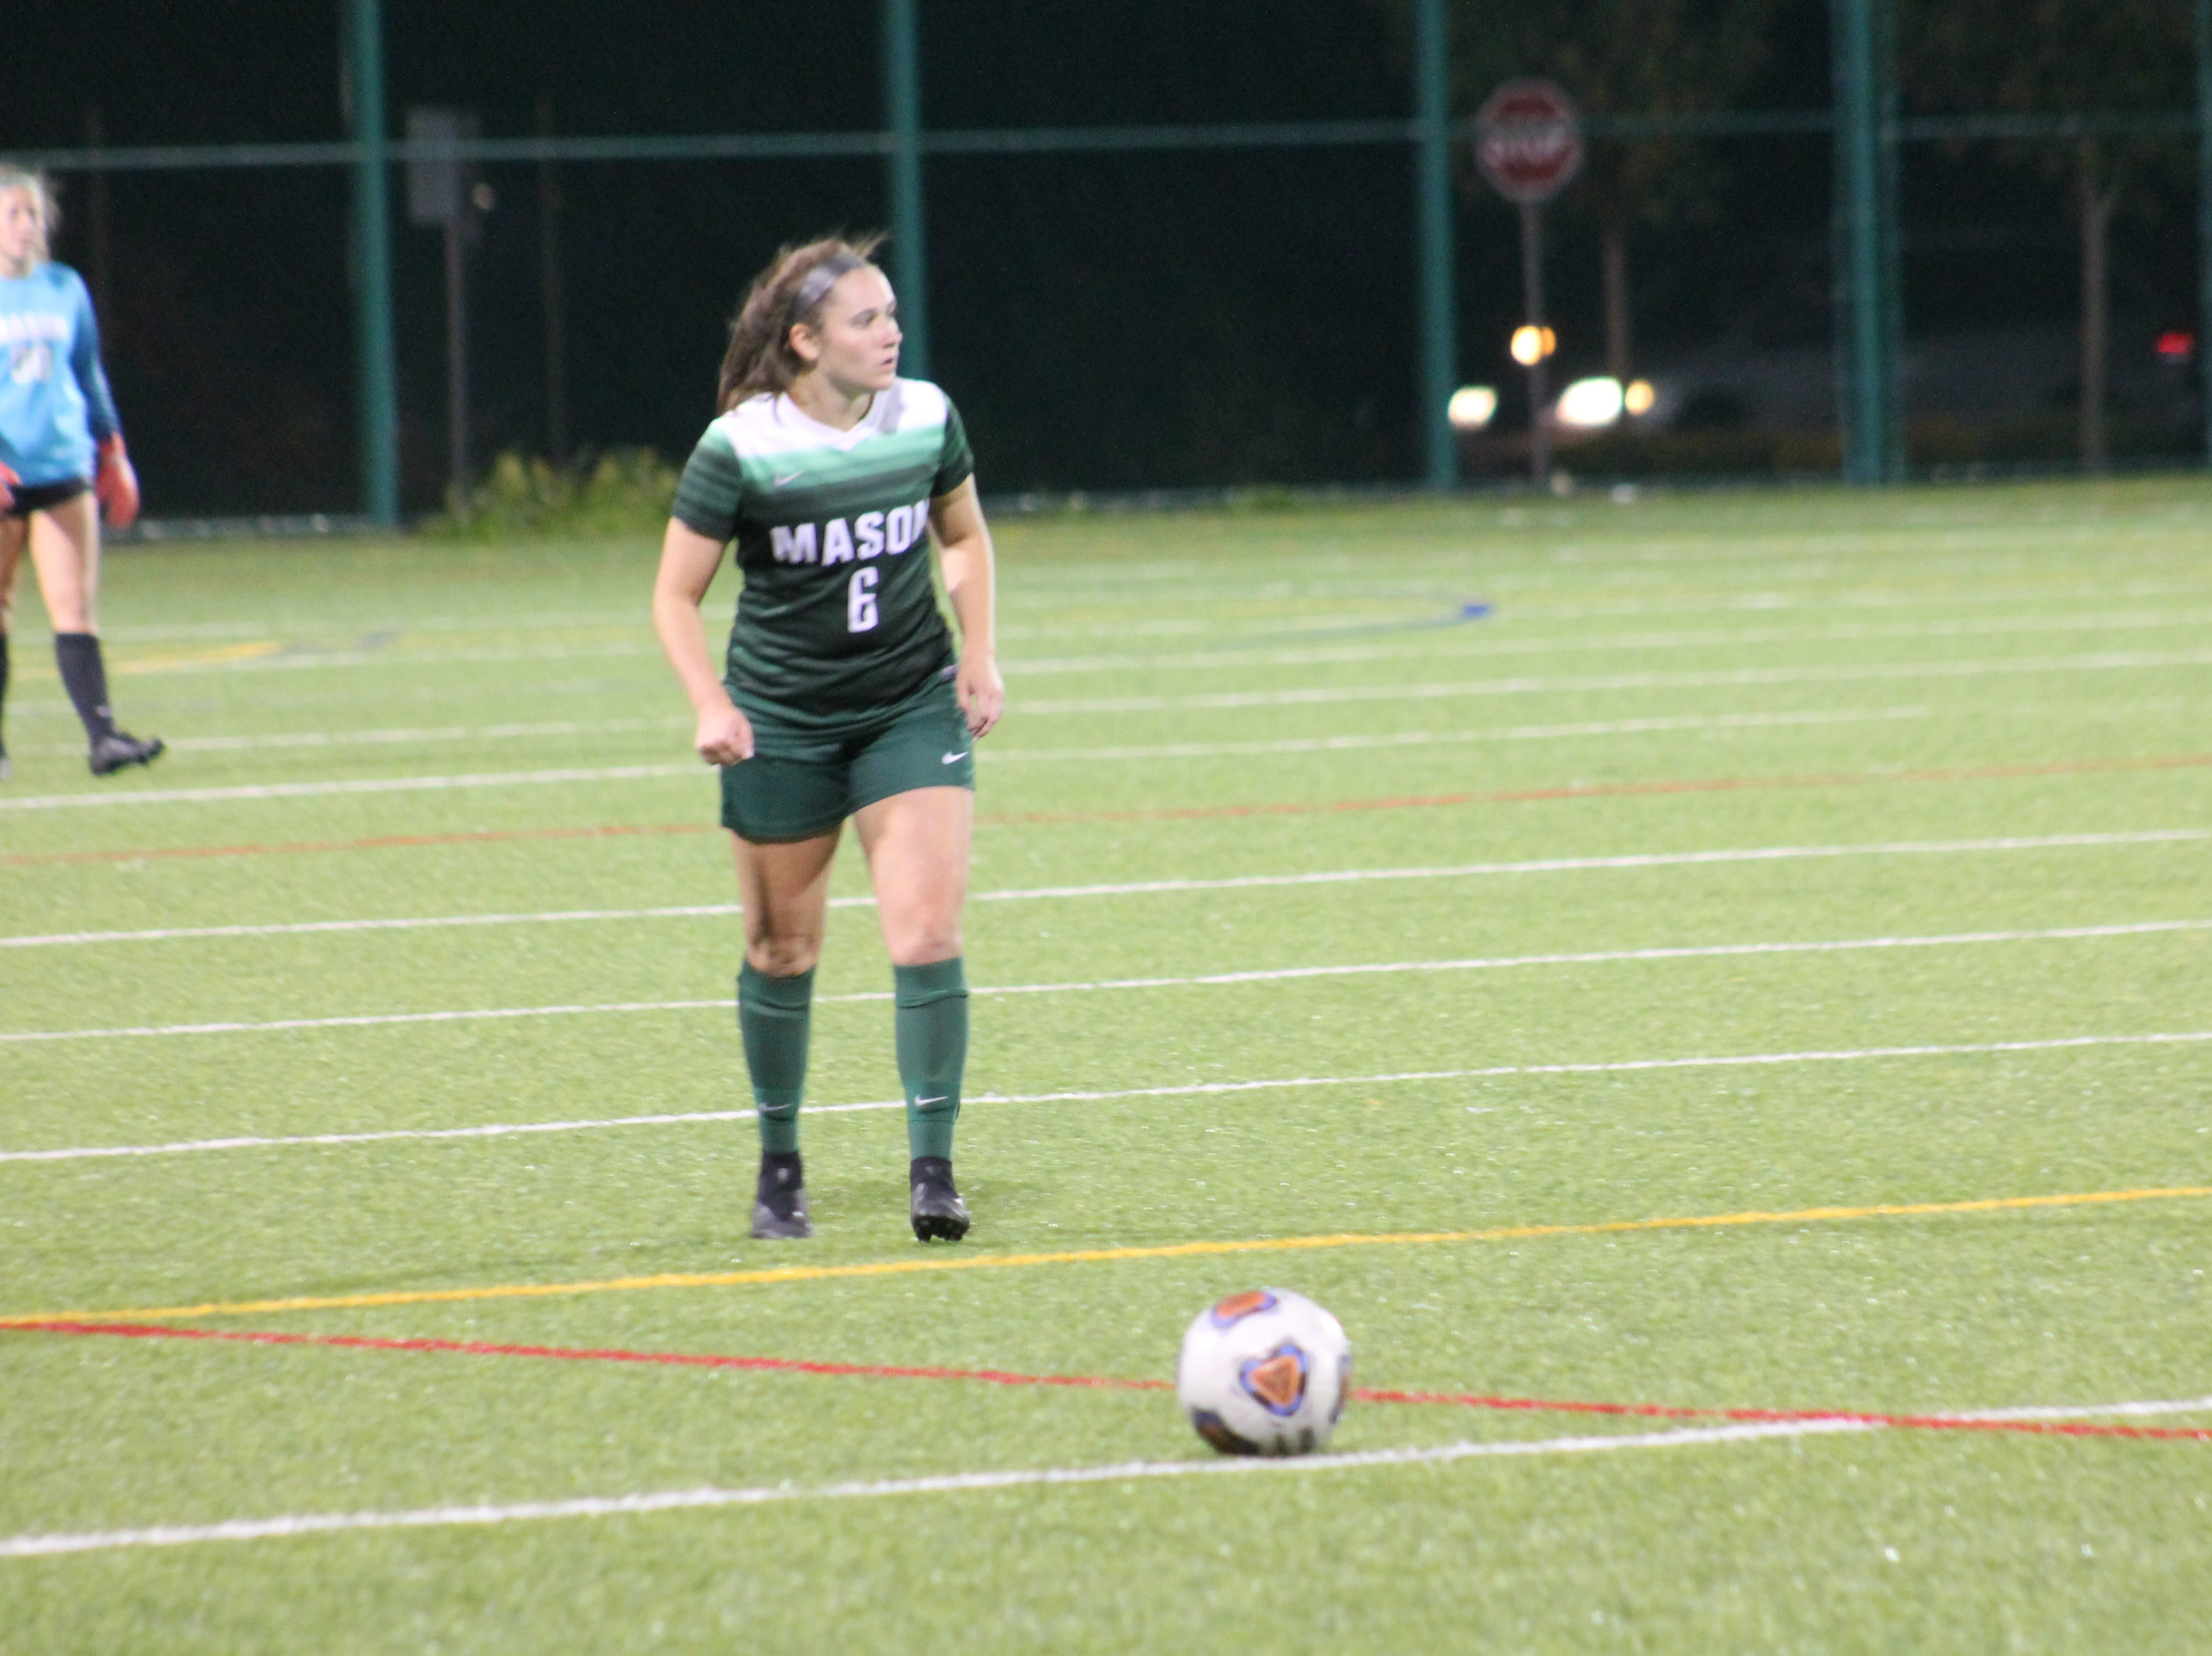 Mason senior midfielder Victoria Bonno looks ahead before the free kick against Fairfield